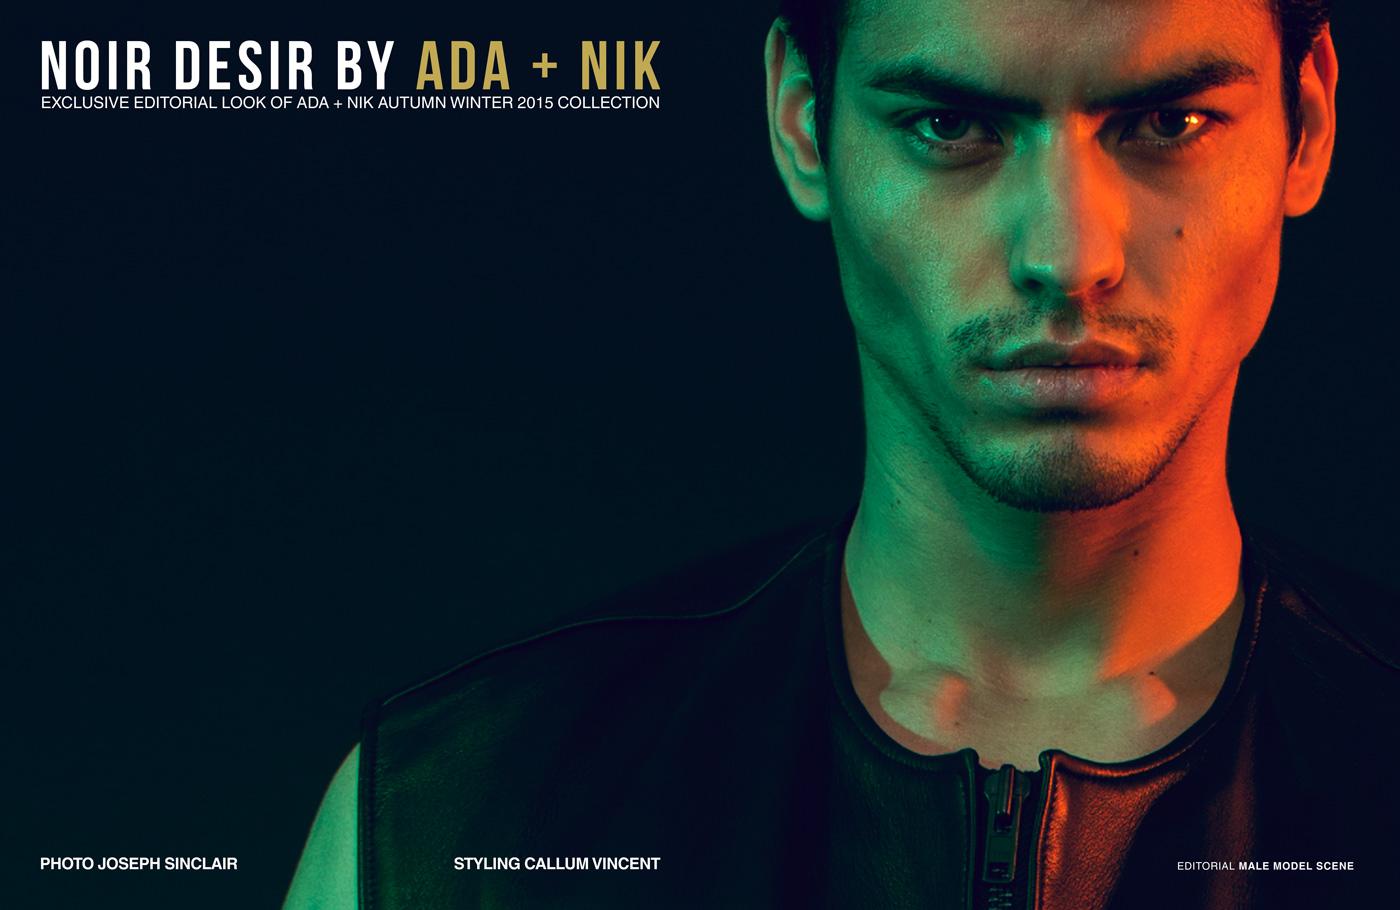 NOIR DESIR ft. ADA + NIK by Joseph Sinclair for Male Model Scene